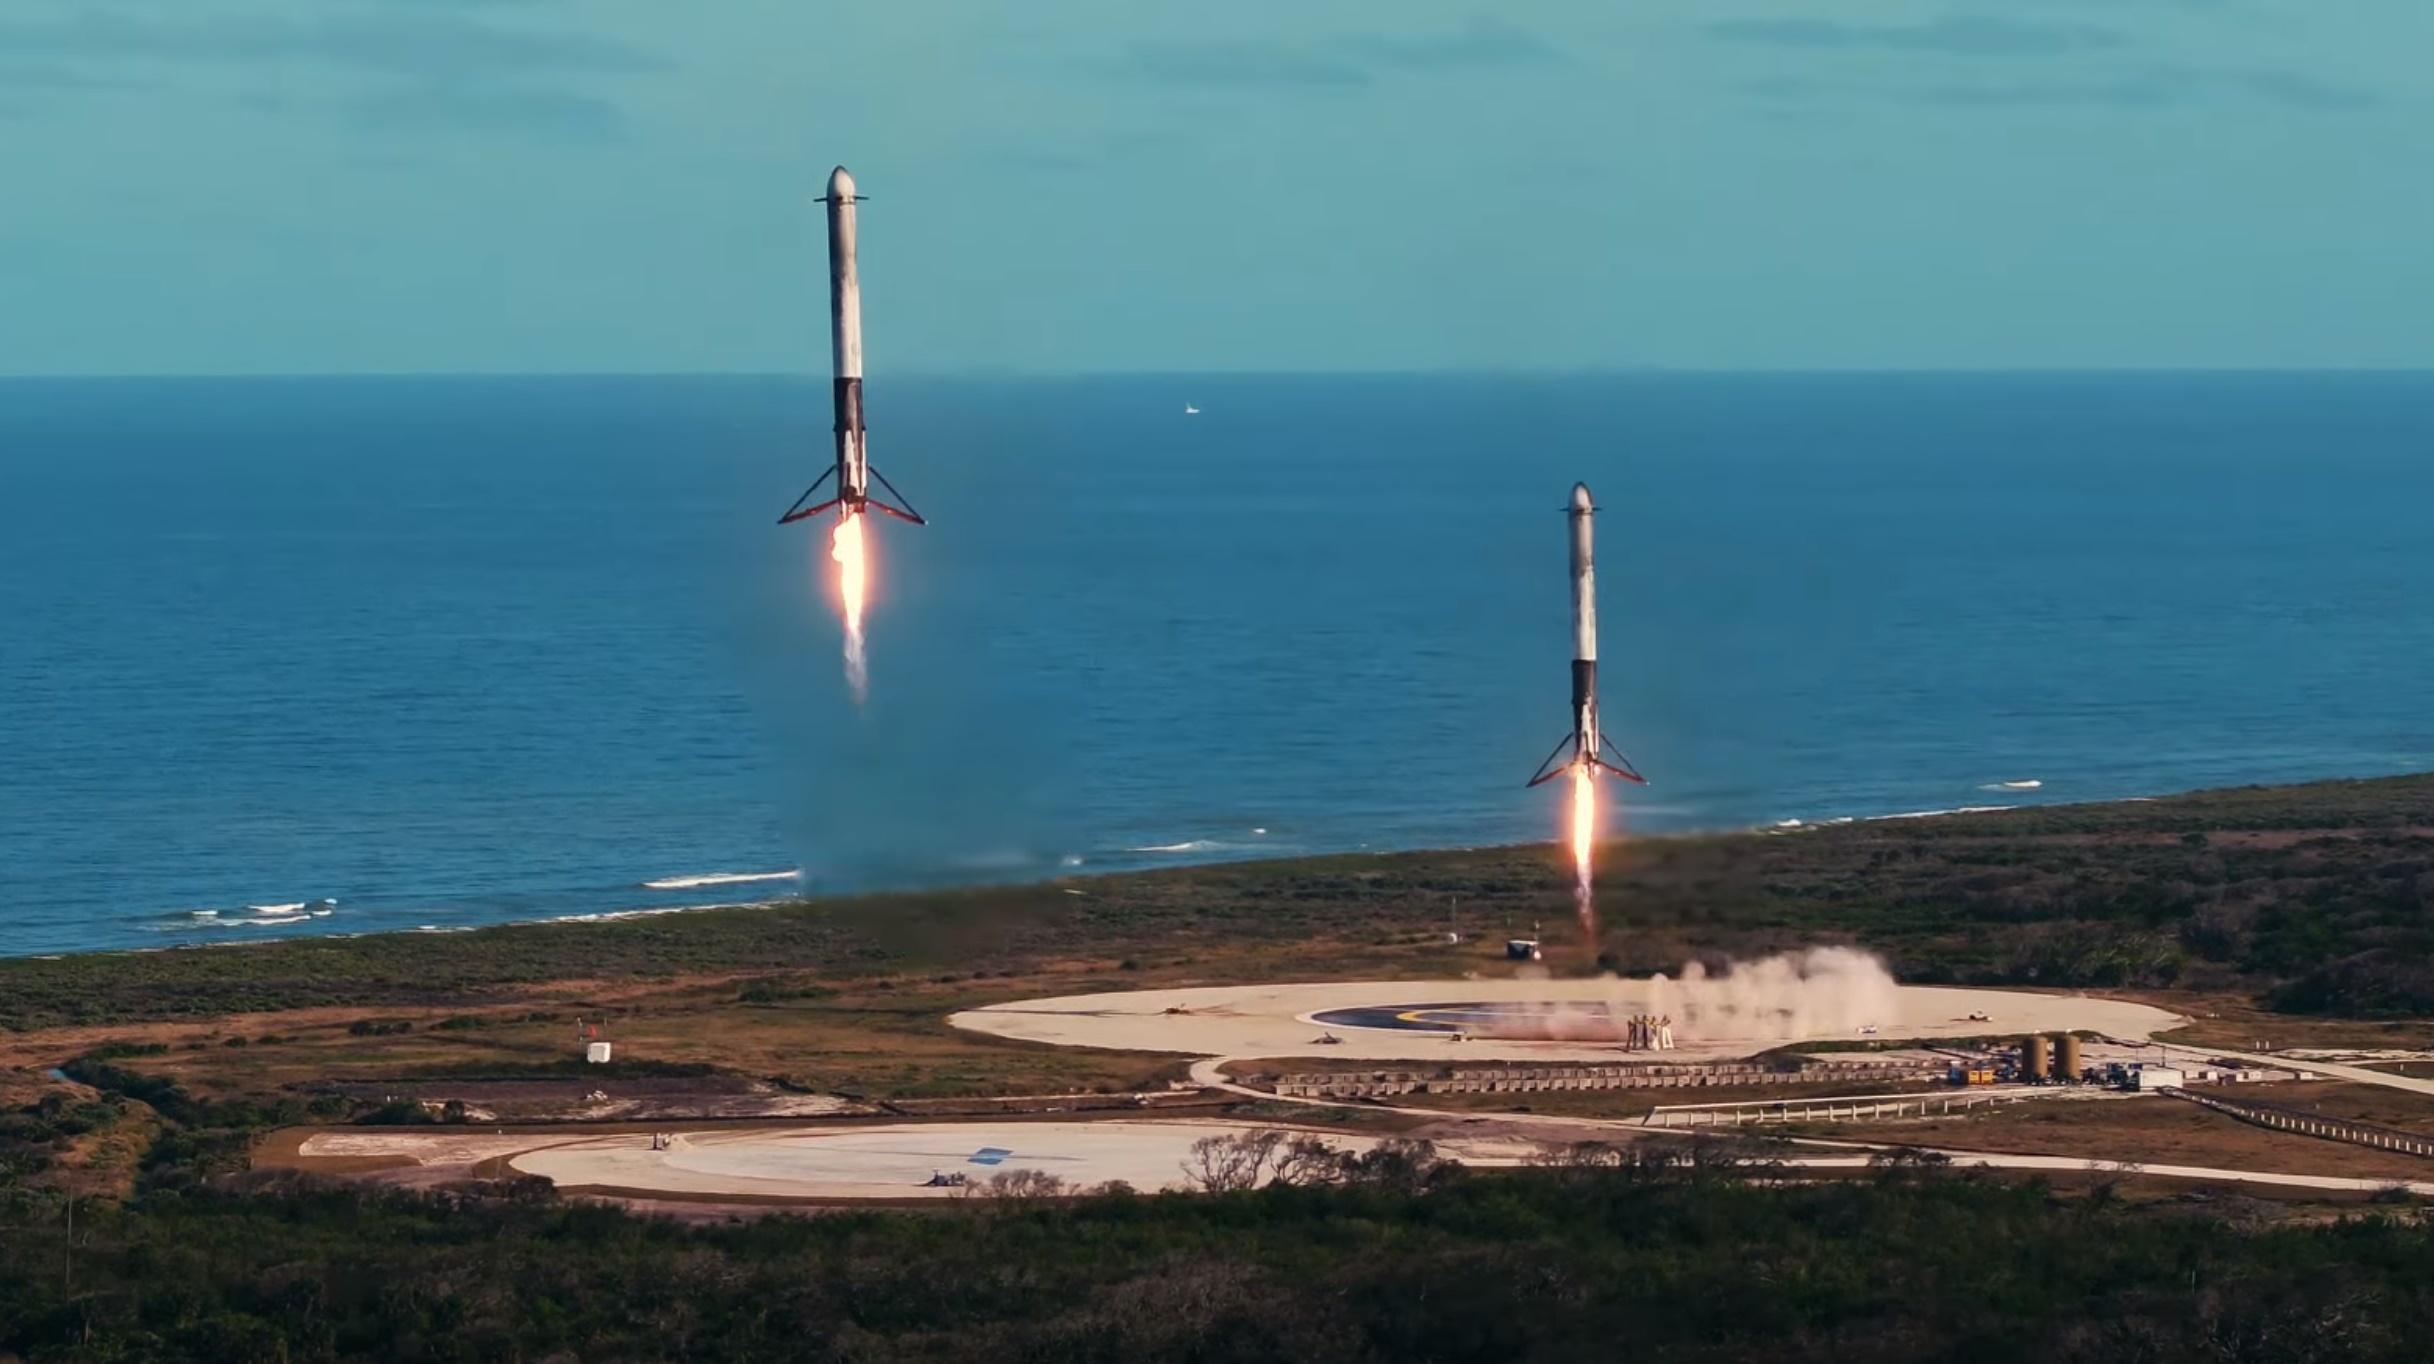 Ракета-носитель Falcon 9 Block 5 успешно вывела на орбиту спутник связи Бангладеш